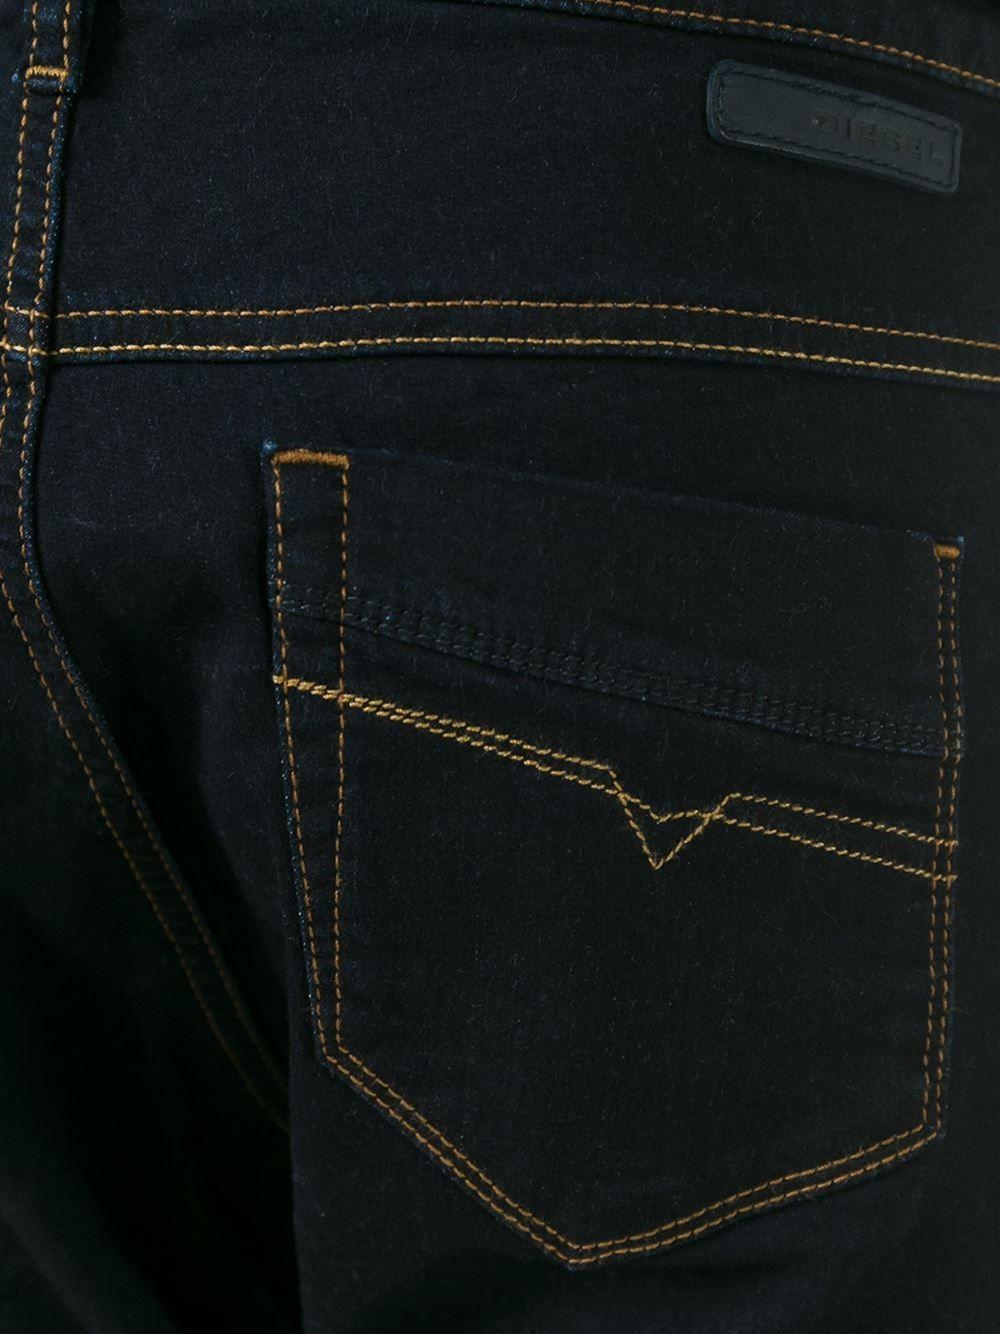 a31aab5646e Diesel Tapered Jeans - Jean Pierre Bua - Farfetch.com